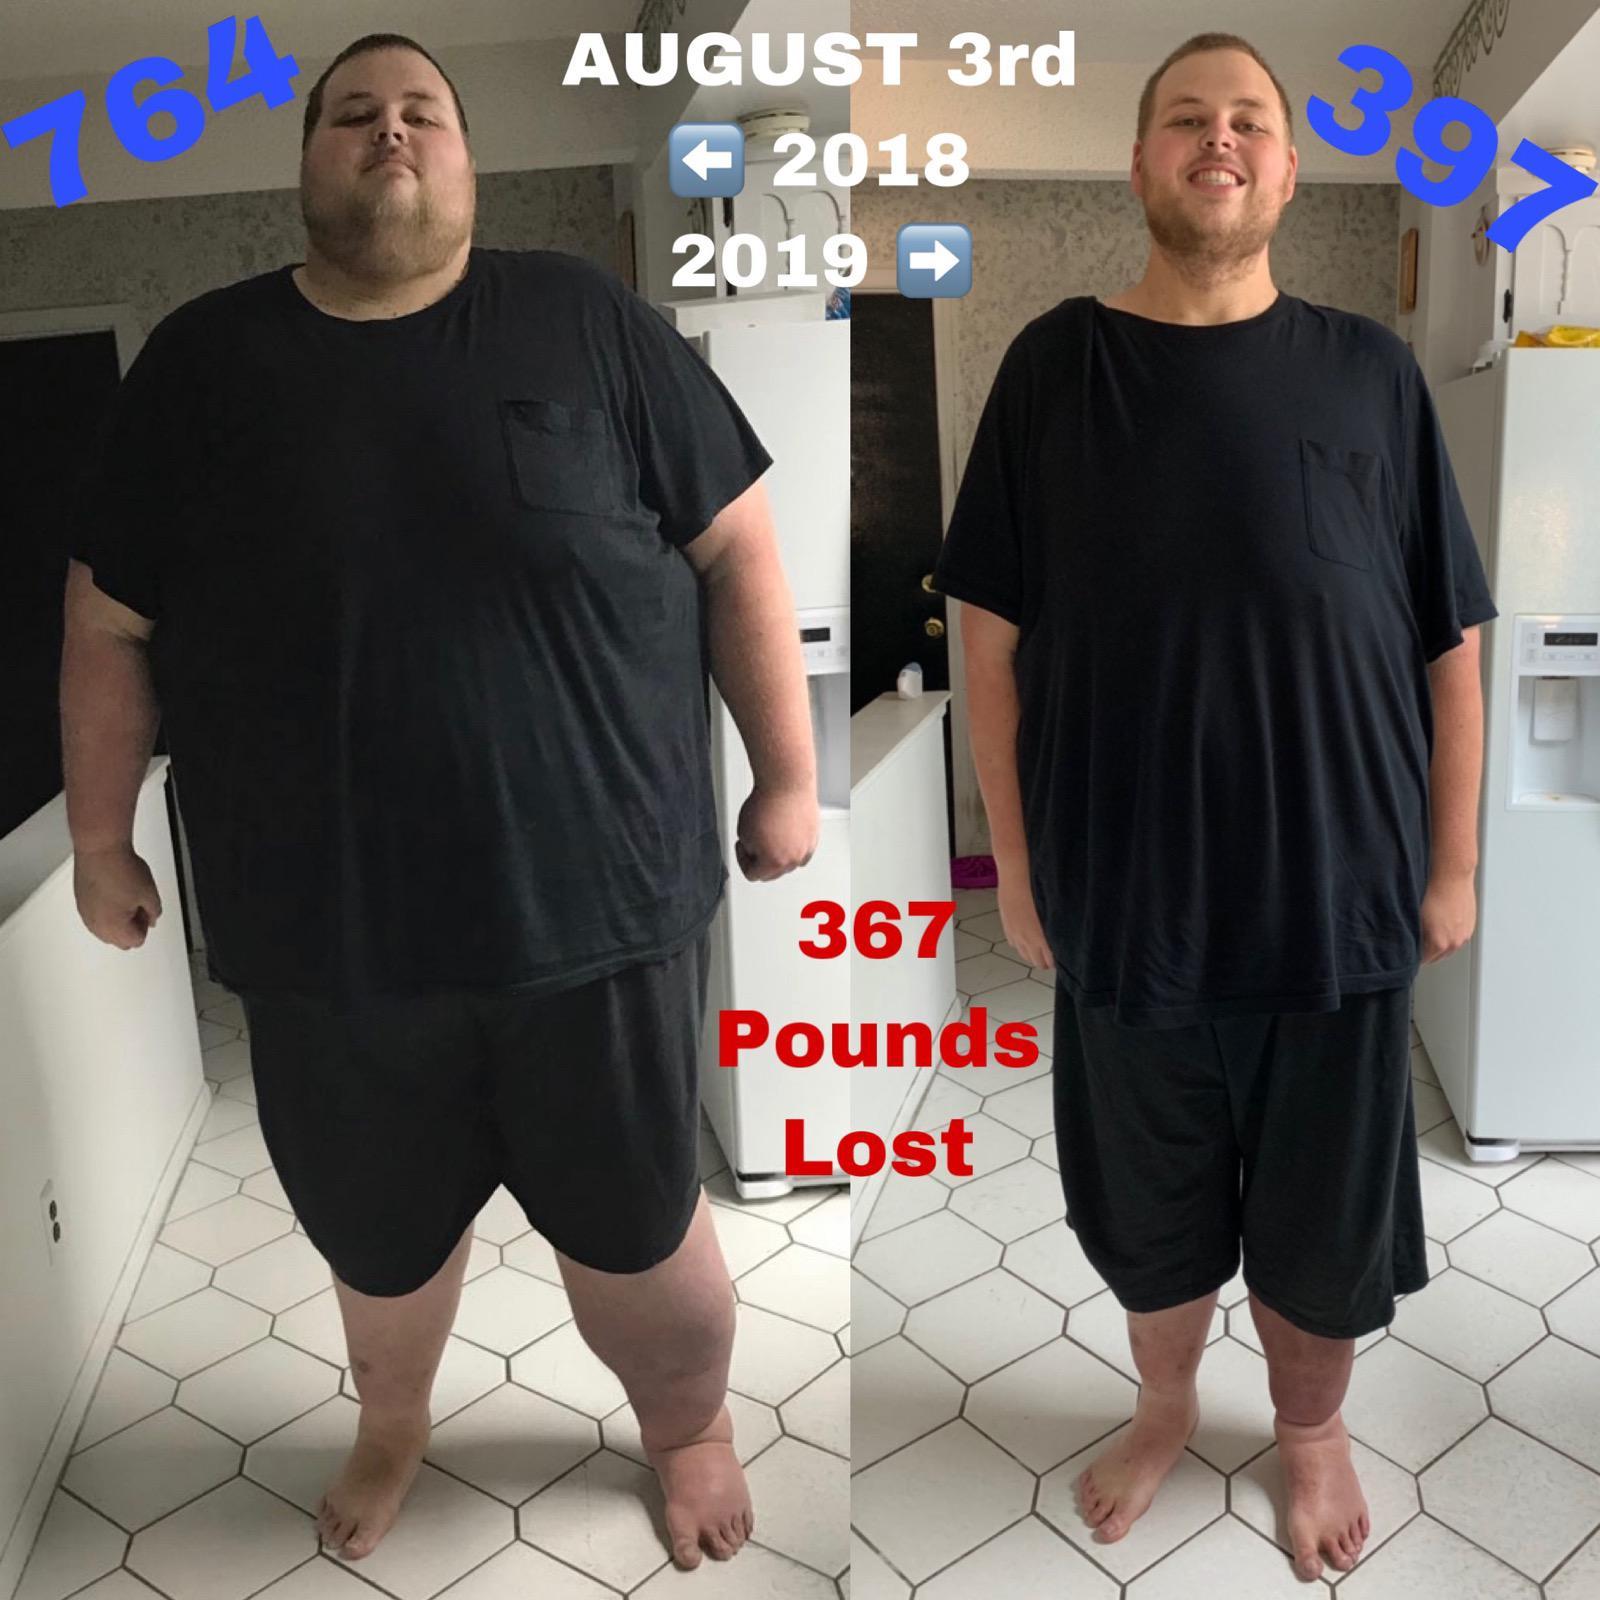 367 lbs Fat Loss 6 foot 8 Male 764 lbs to 397 lbs